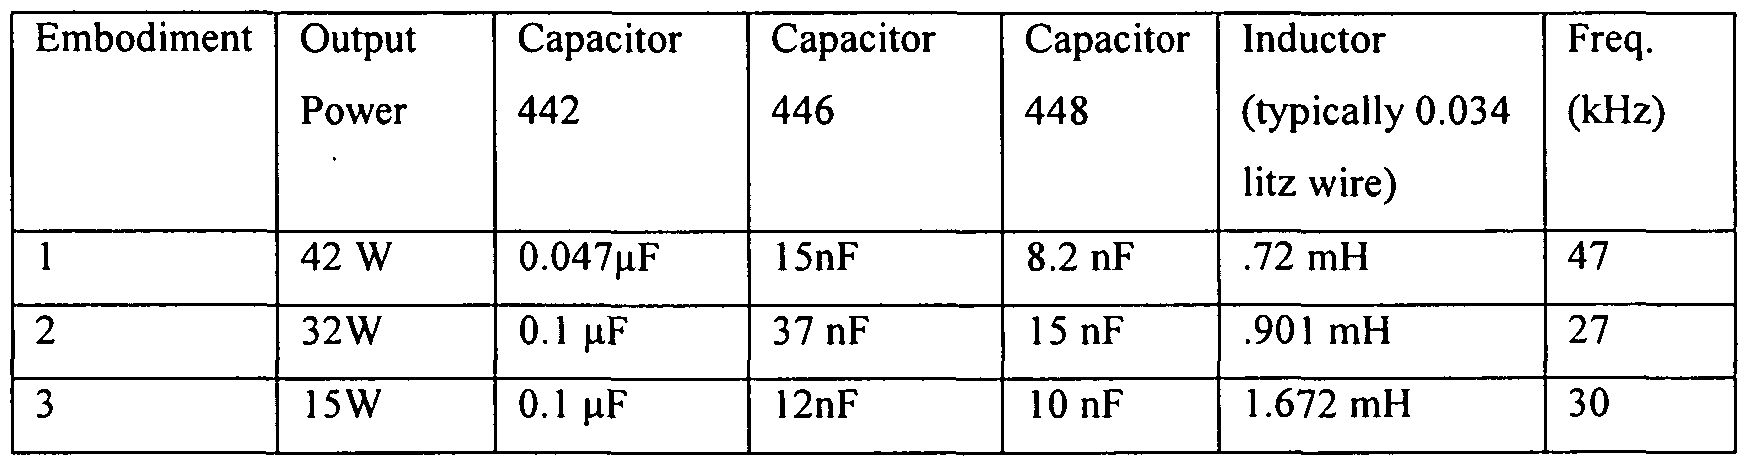 Wo2009099645a1 Energy Savings Circuitry For A Lighting Ballast Electronic Choke Circuit Diagram 40w Tube Light Figure Imgf000019 0001